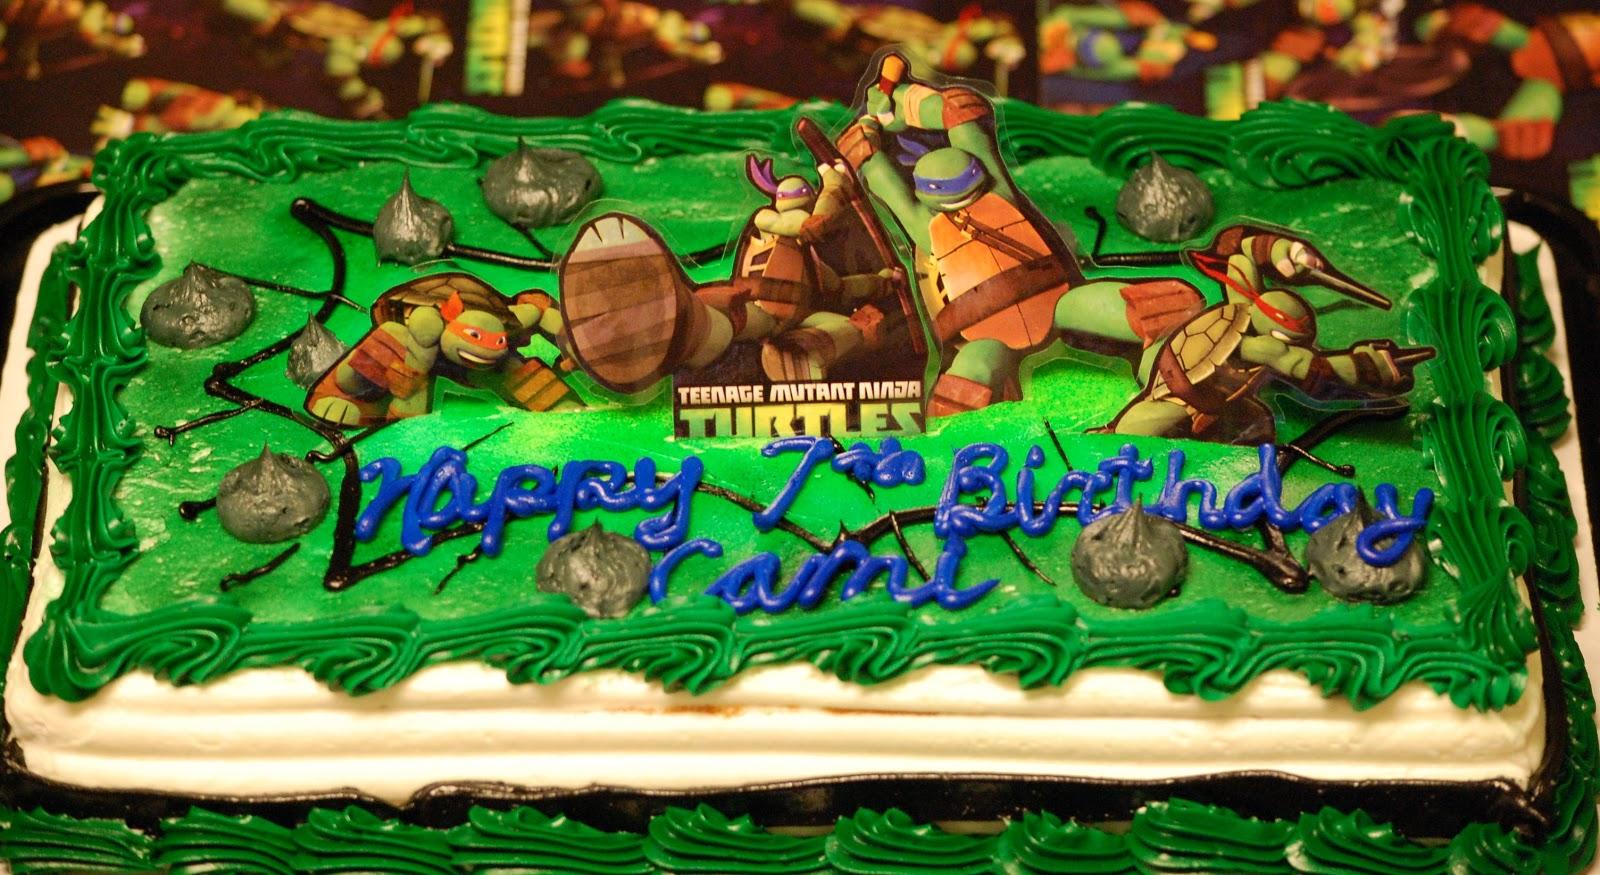 Ninja Turtle Cake Walmart